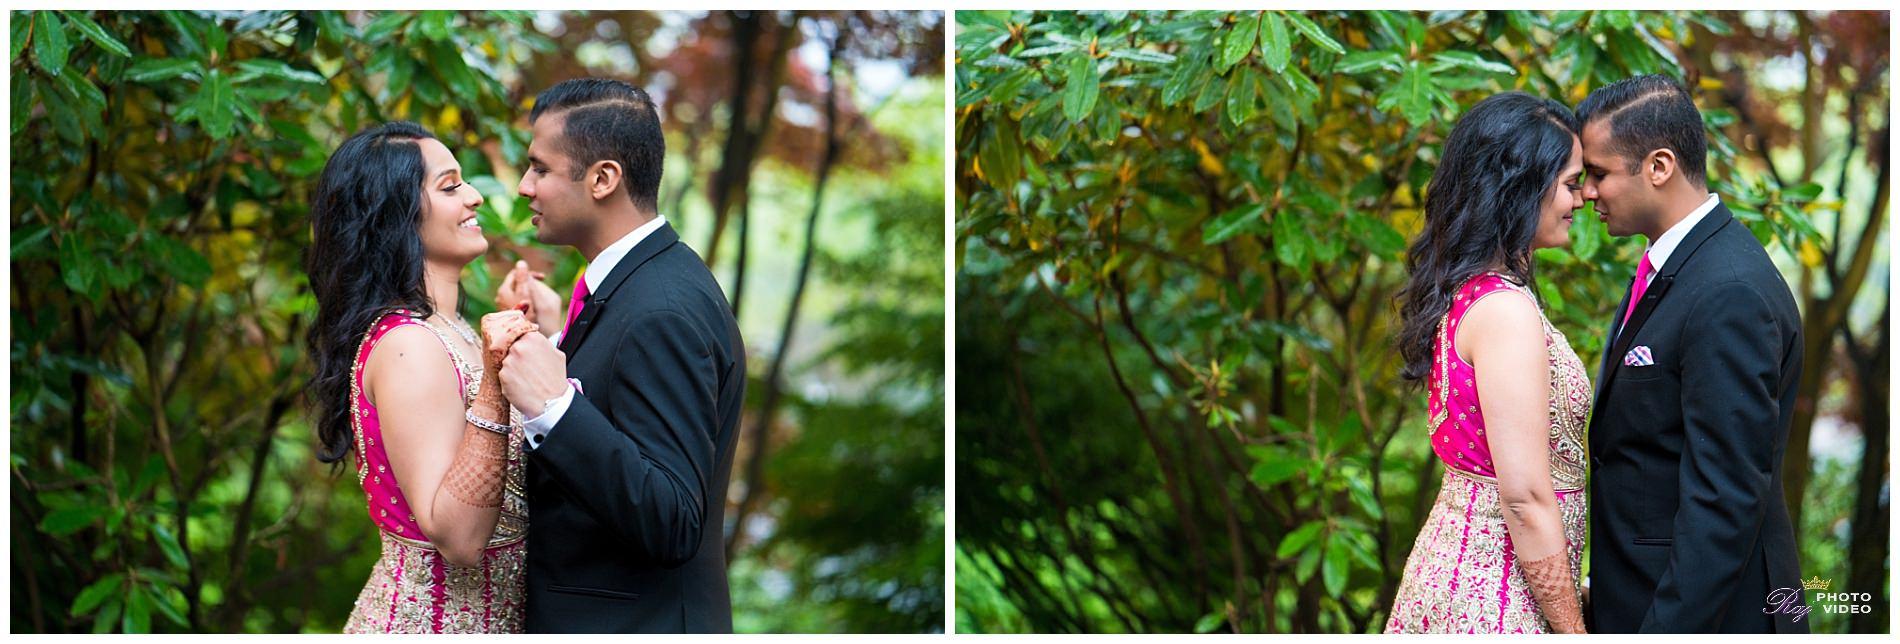 Martinsville-Gardens-NJ-Indian-Wedding-Ruchi-Vishal-47.jpg